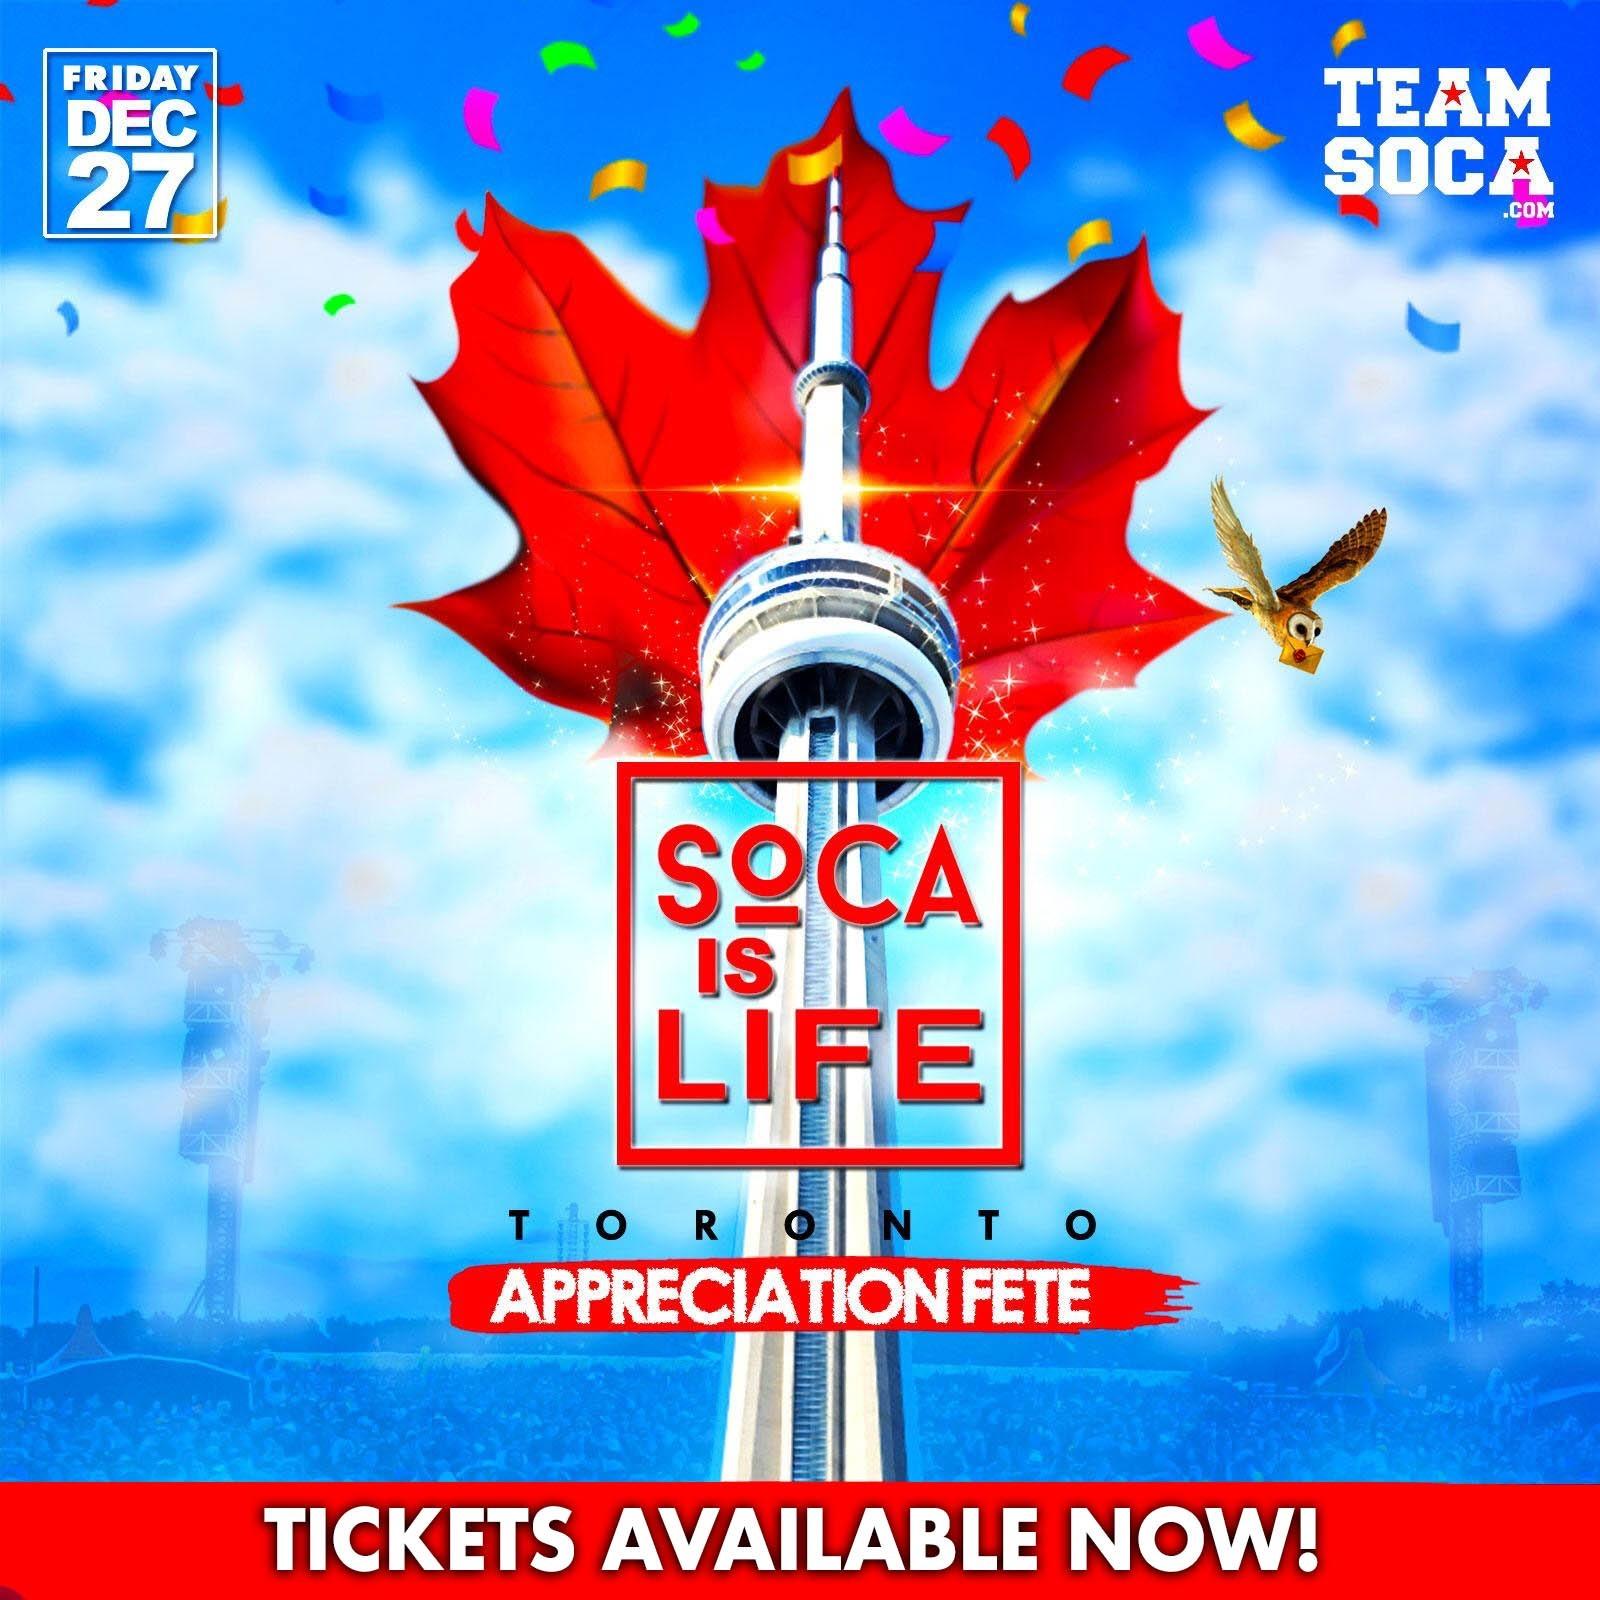 Soca Is Life - Appreciation Fete